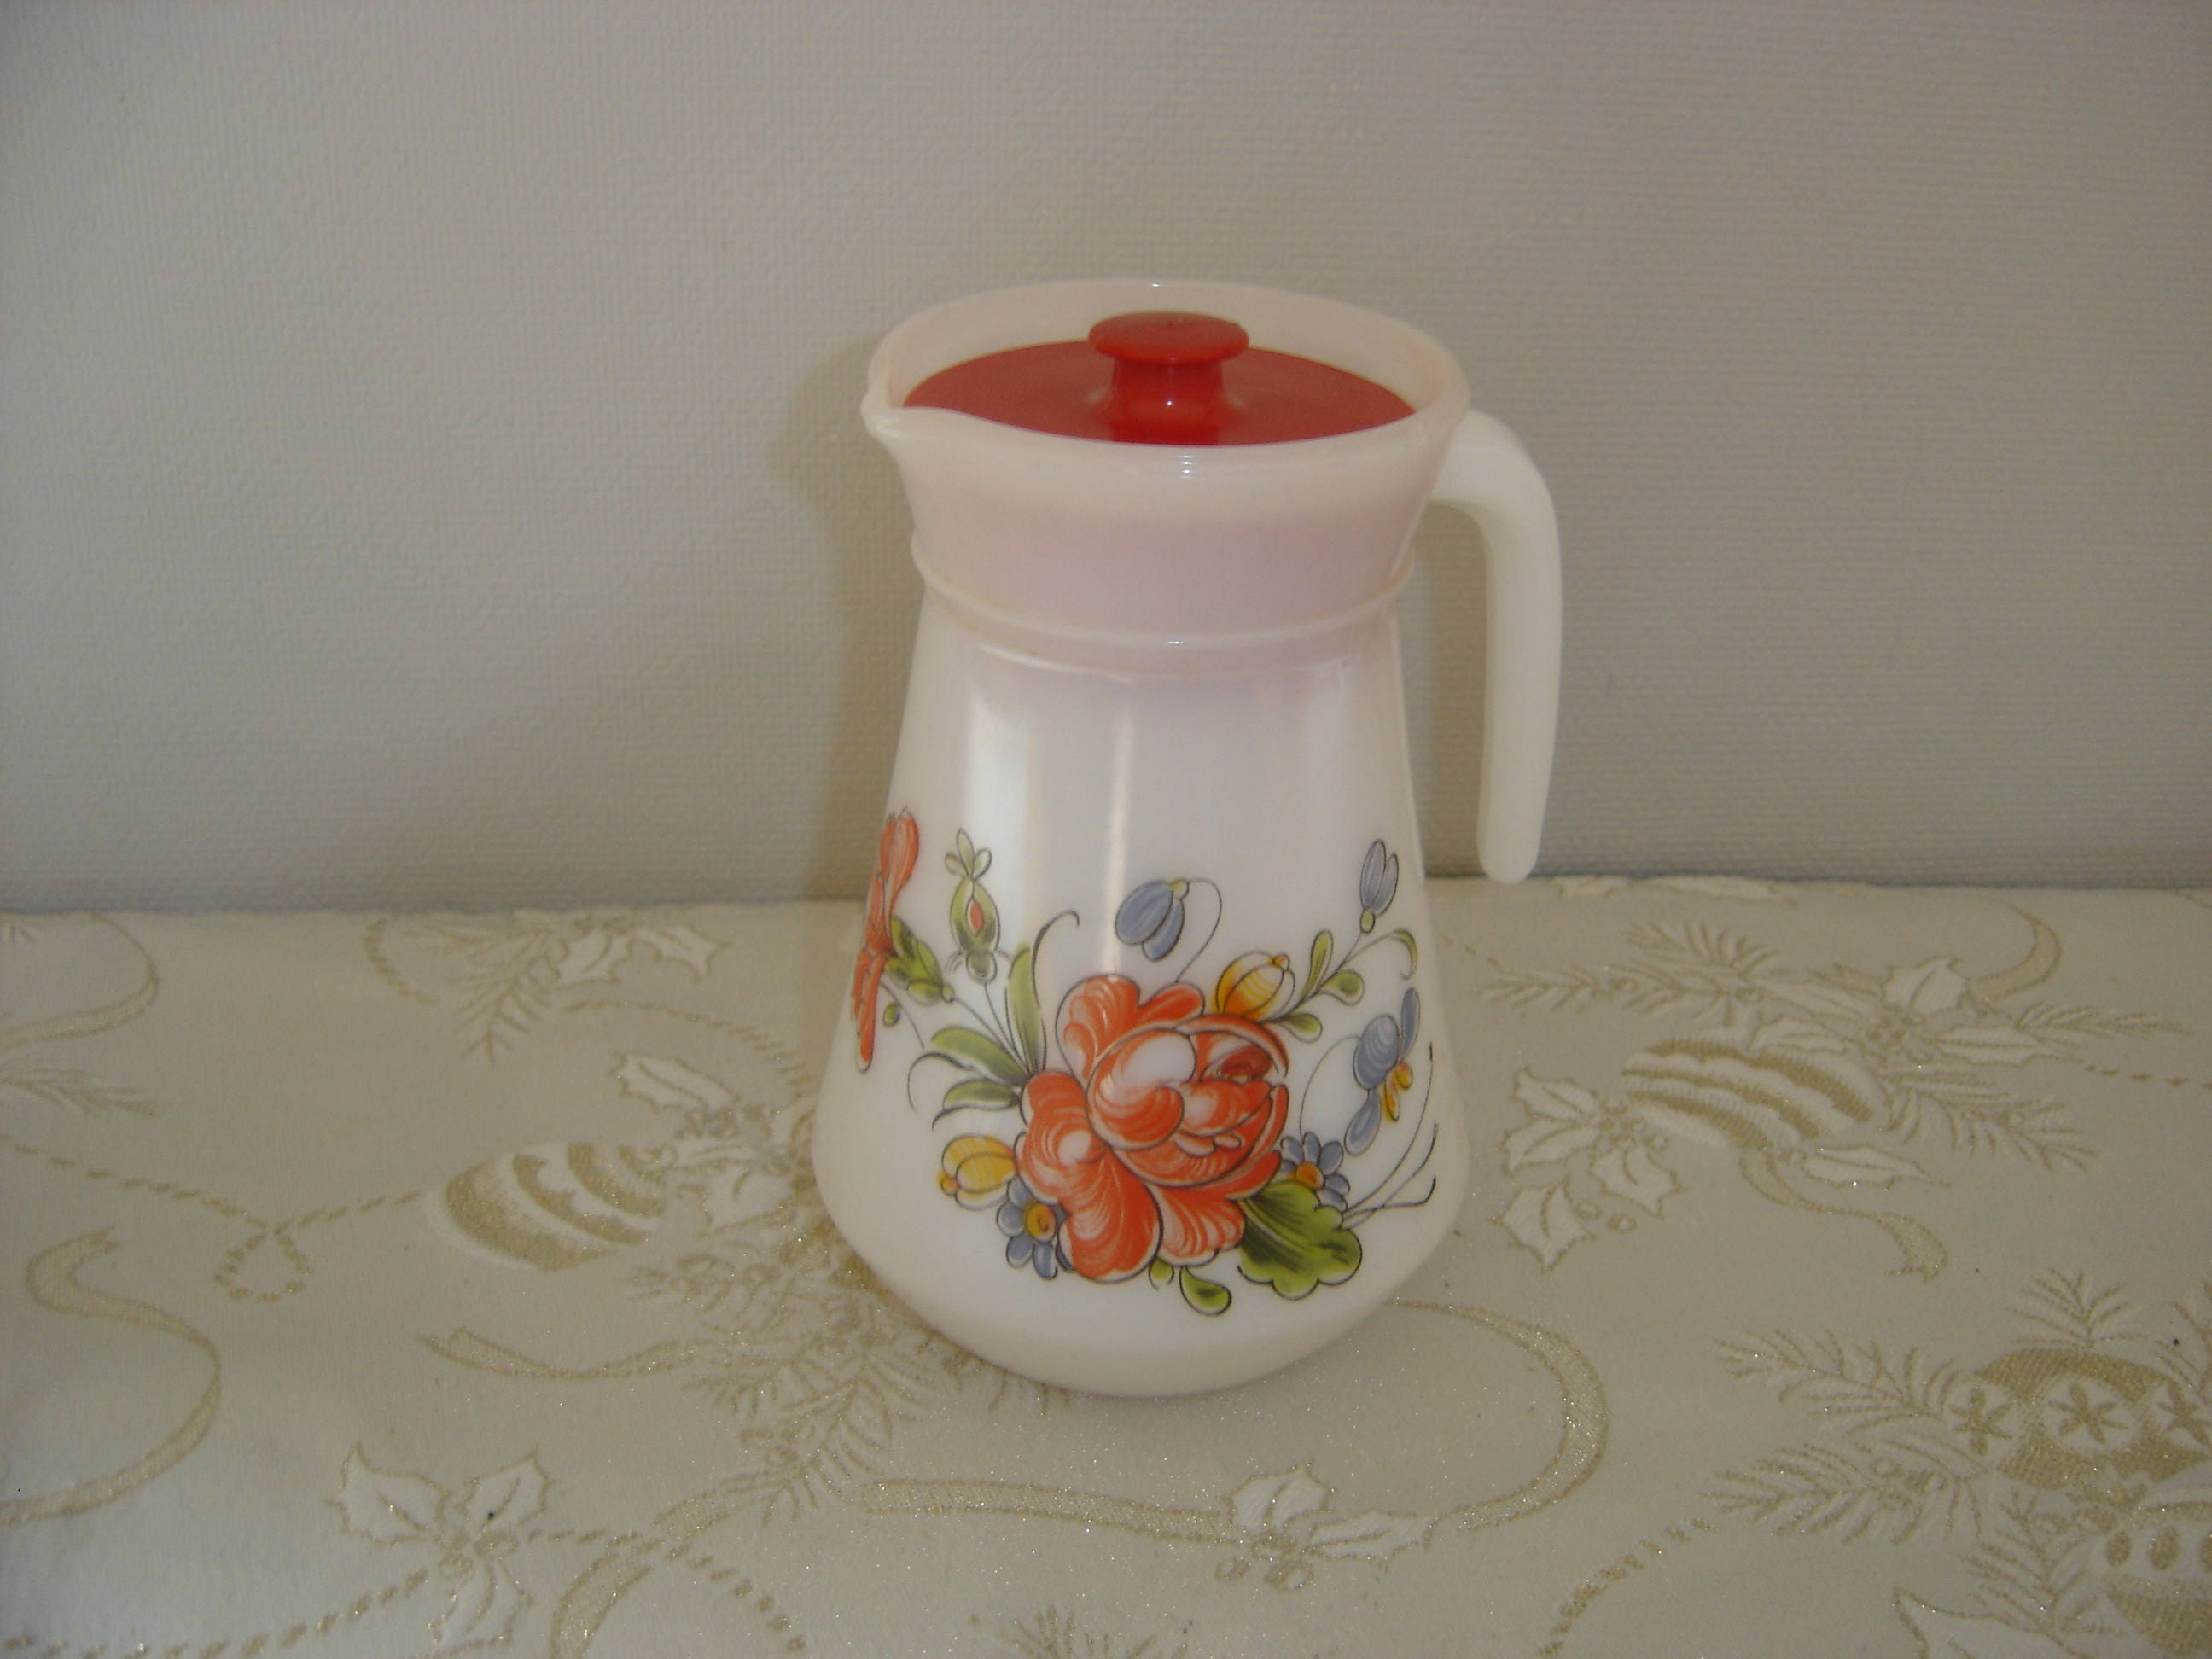 pichet jug cruche arcopal glas pitcher etat neuf avec. Black Bedroom Furniture Sets. Home Design Ideas